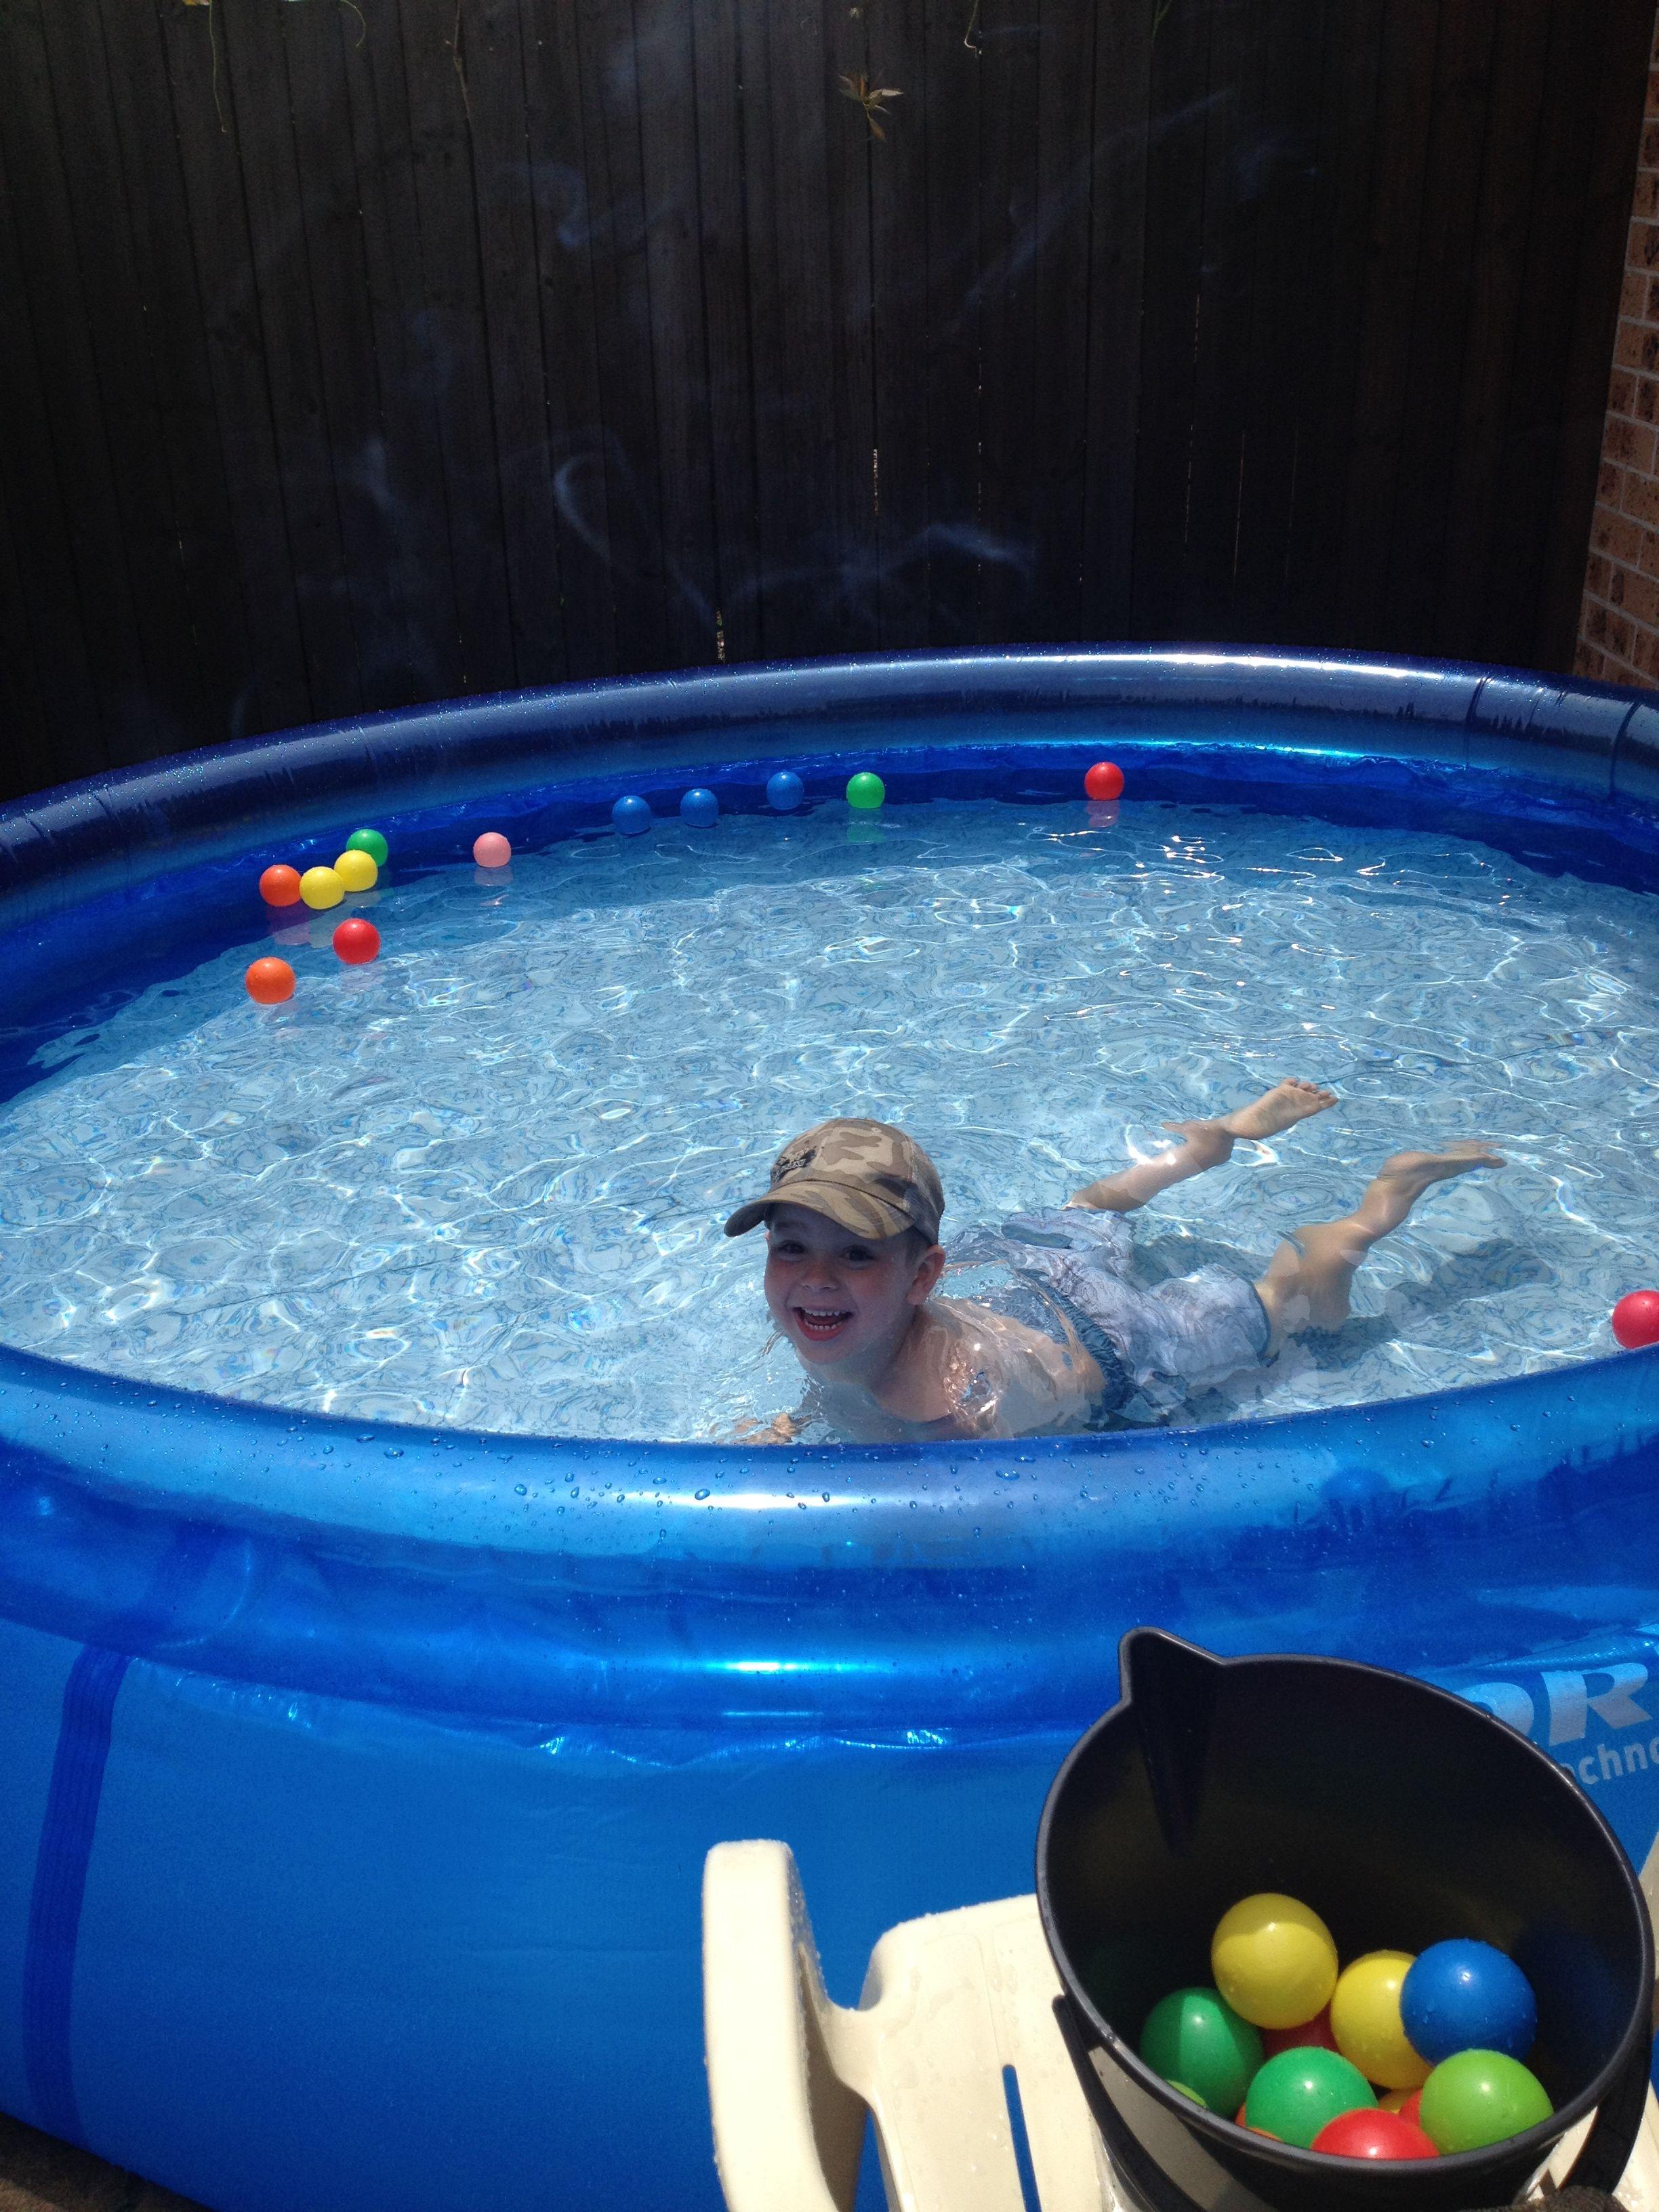 Pin By Dana Rafferty On Photos Blow Up Pool Beautiful Pools Pool